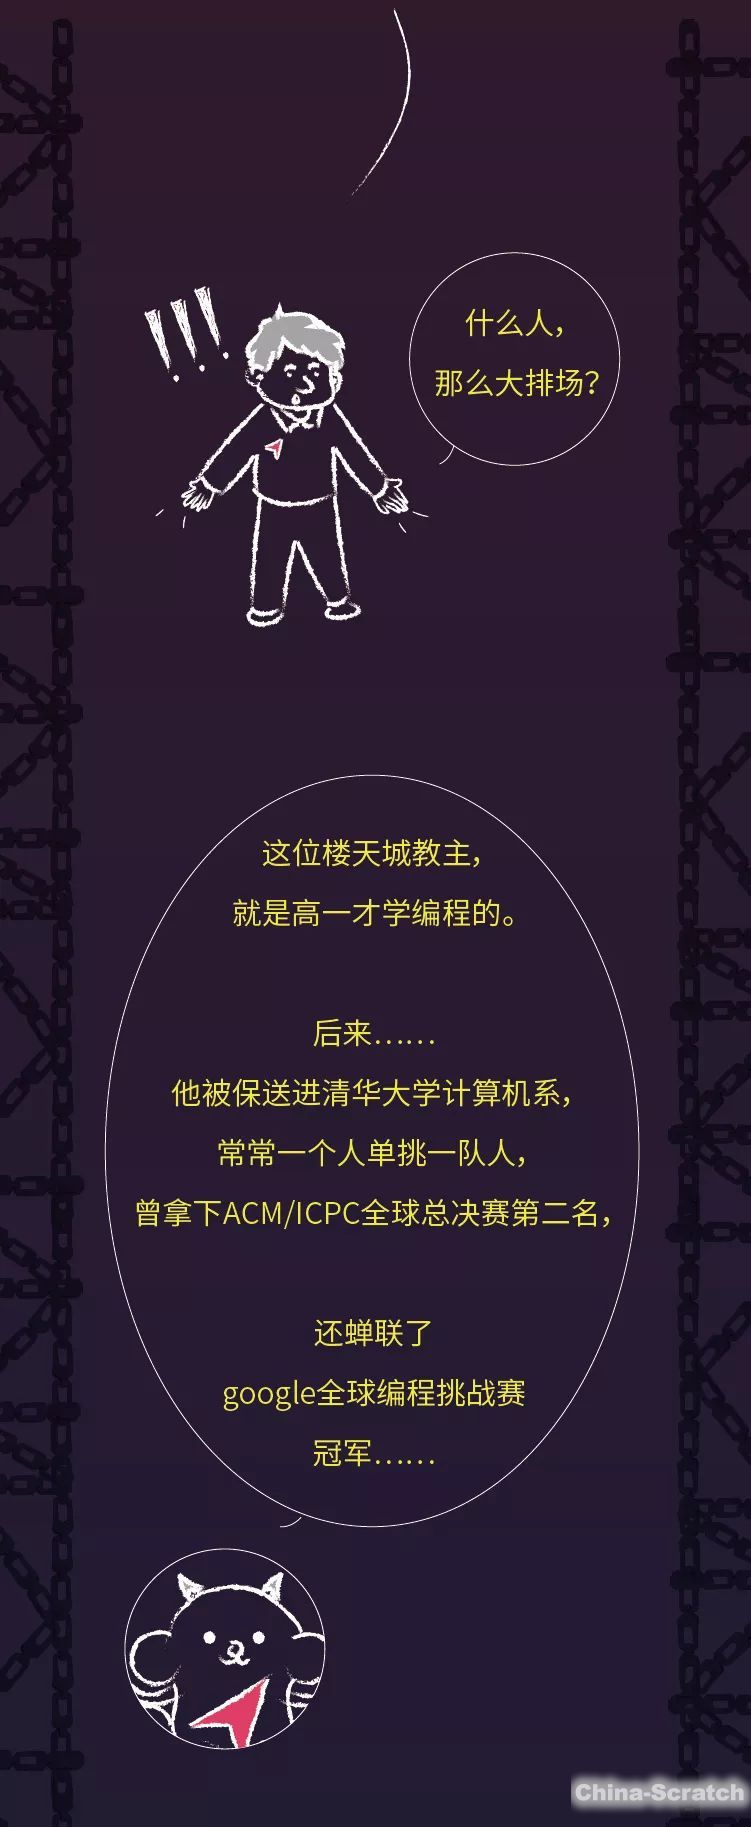 http://www.china-scratch.com/Uploads/timg/190520/1K52J951-15.jpg